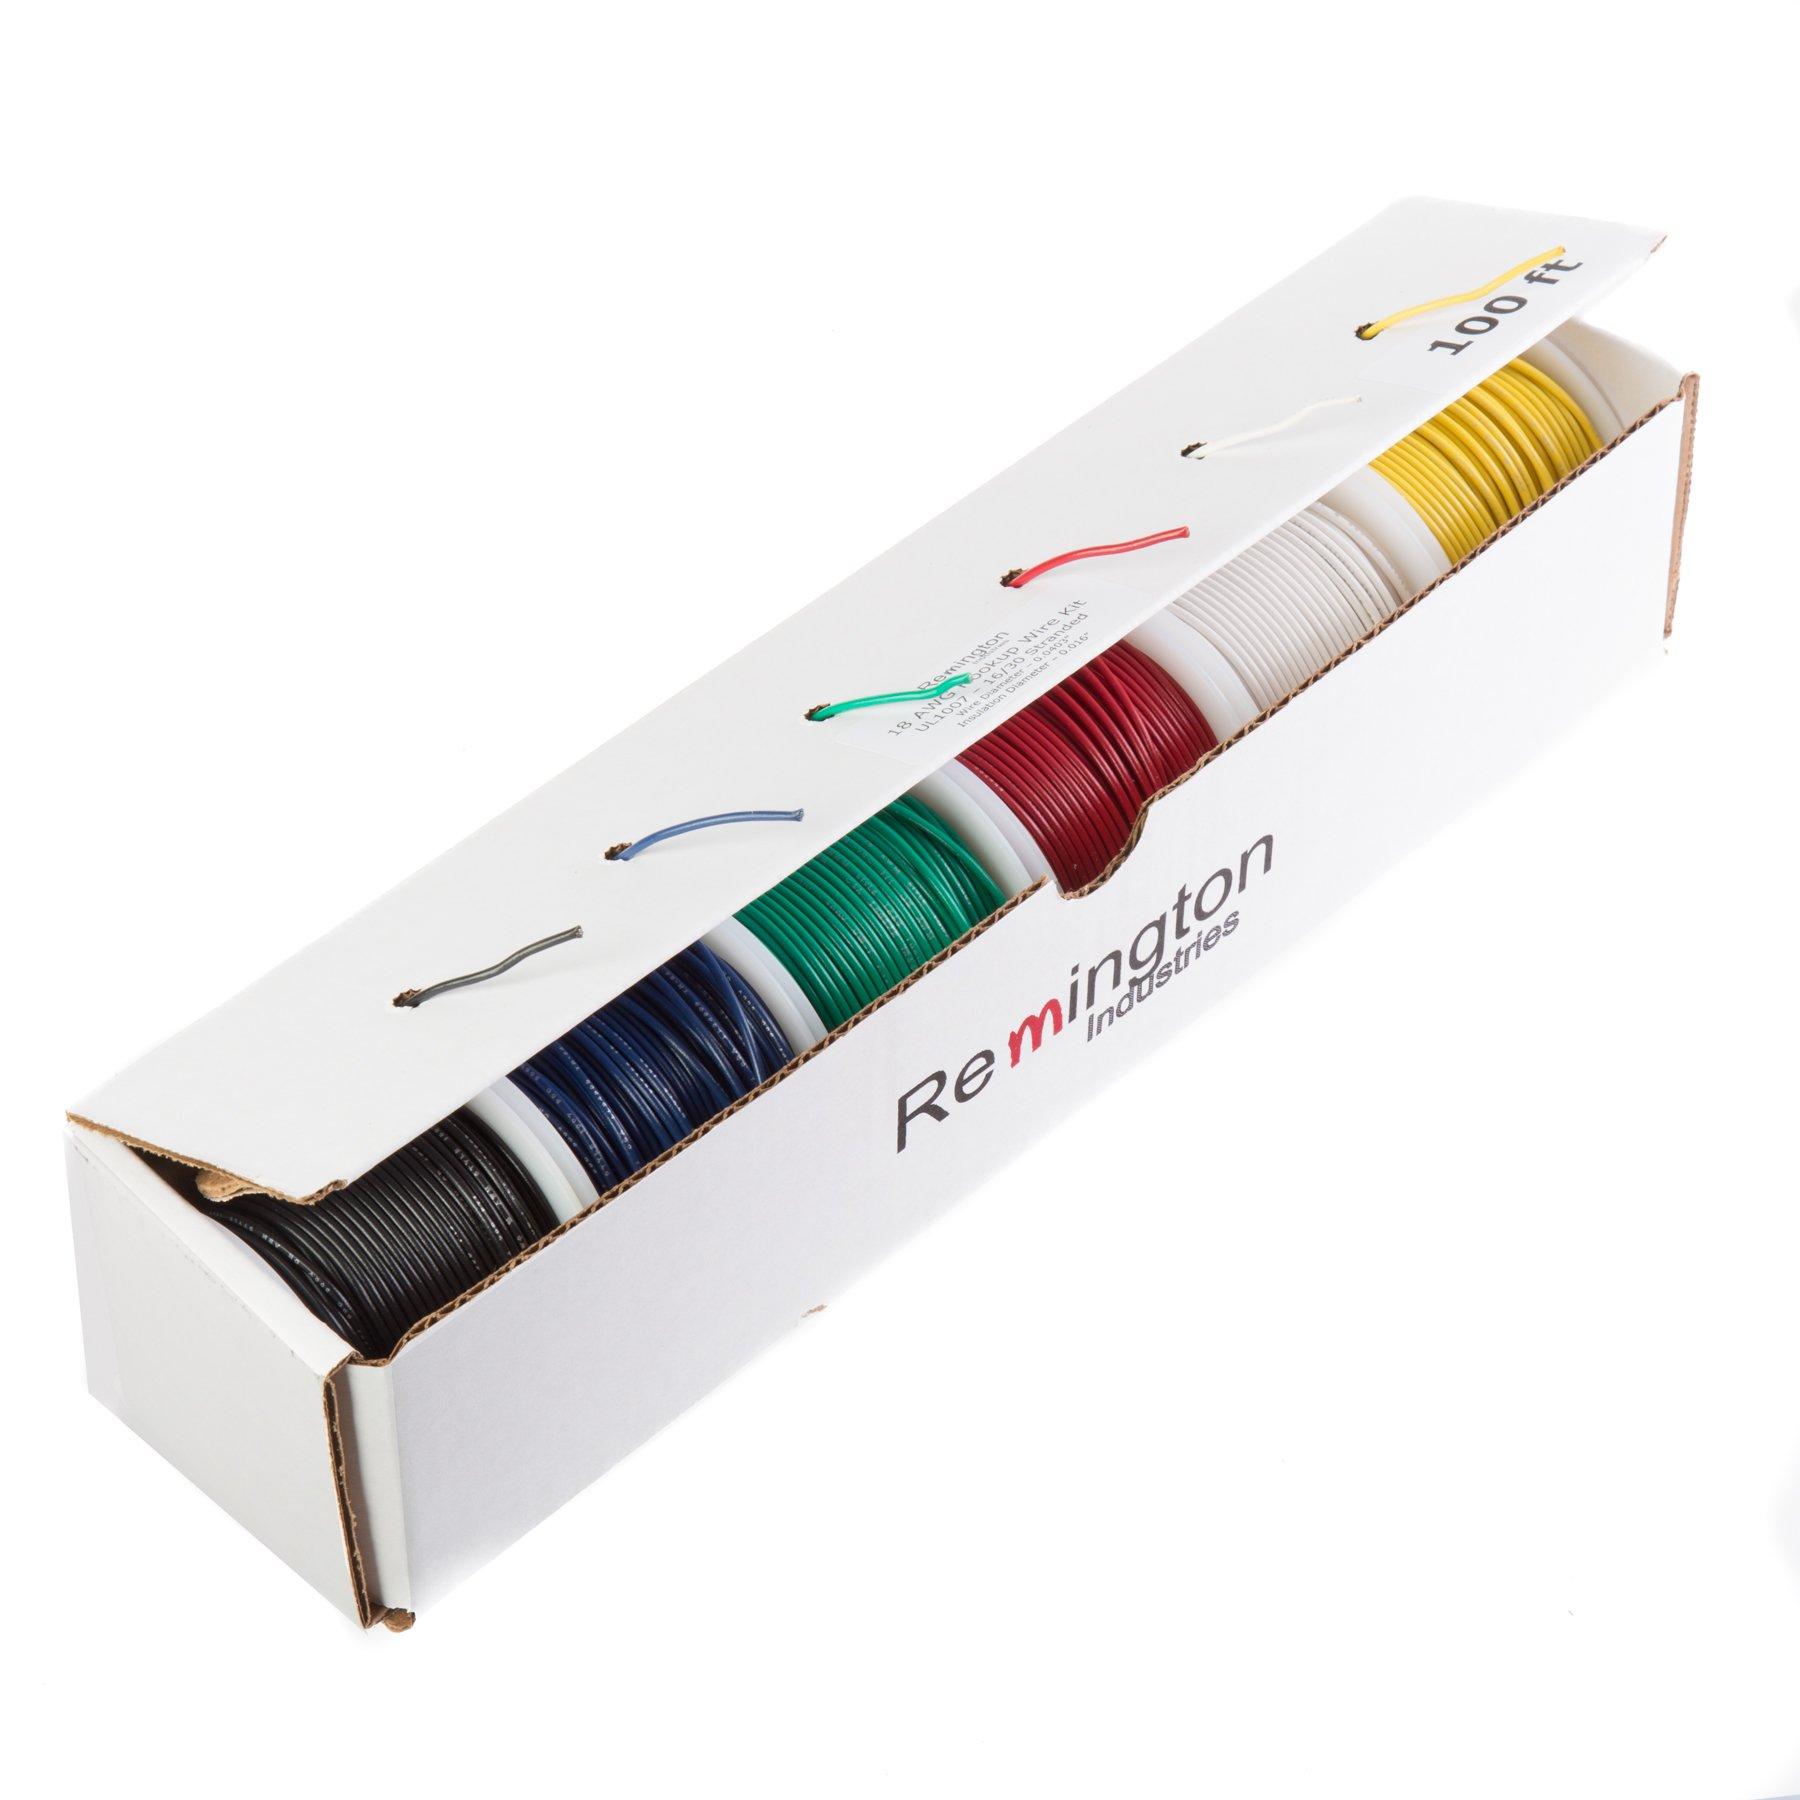 Remington Industries 16UL1007STRKIT100 UL1007 16 AWG Gauge Stranded Hook-Up Wire Kit, 300V, 0.0508'' Diameter, 100' Length Each